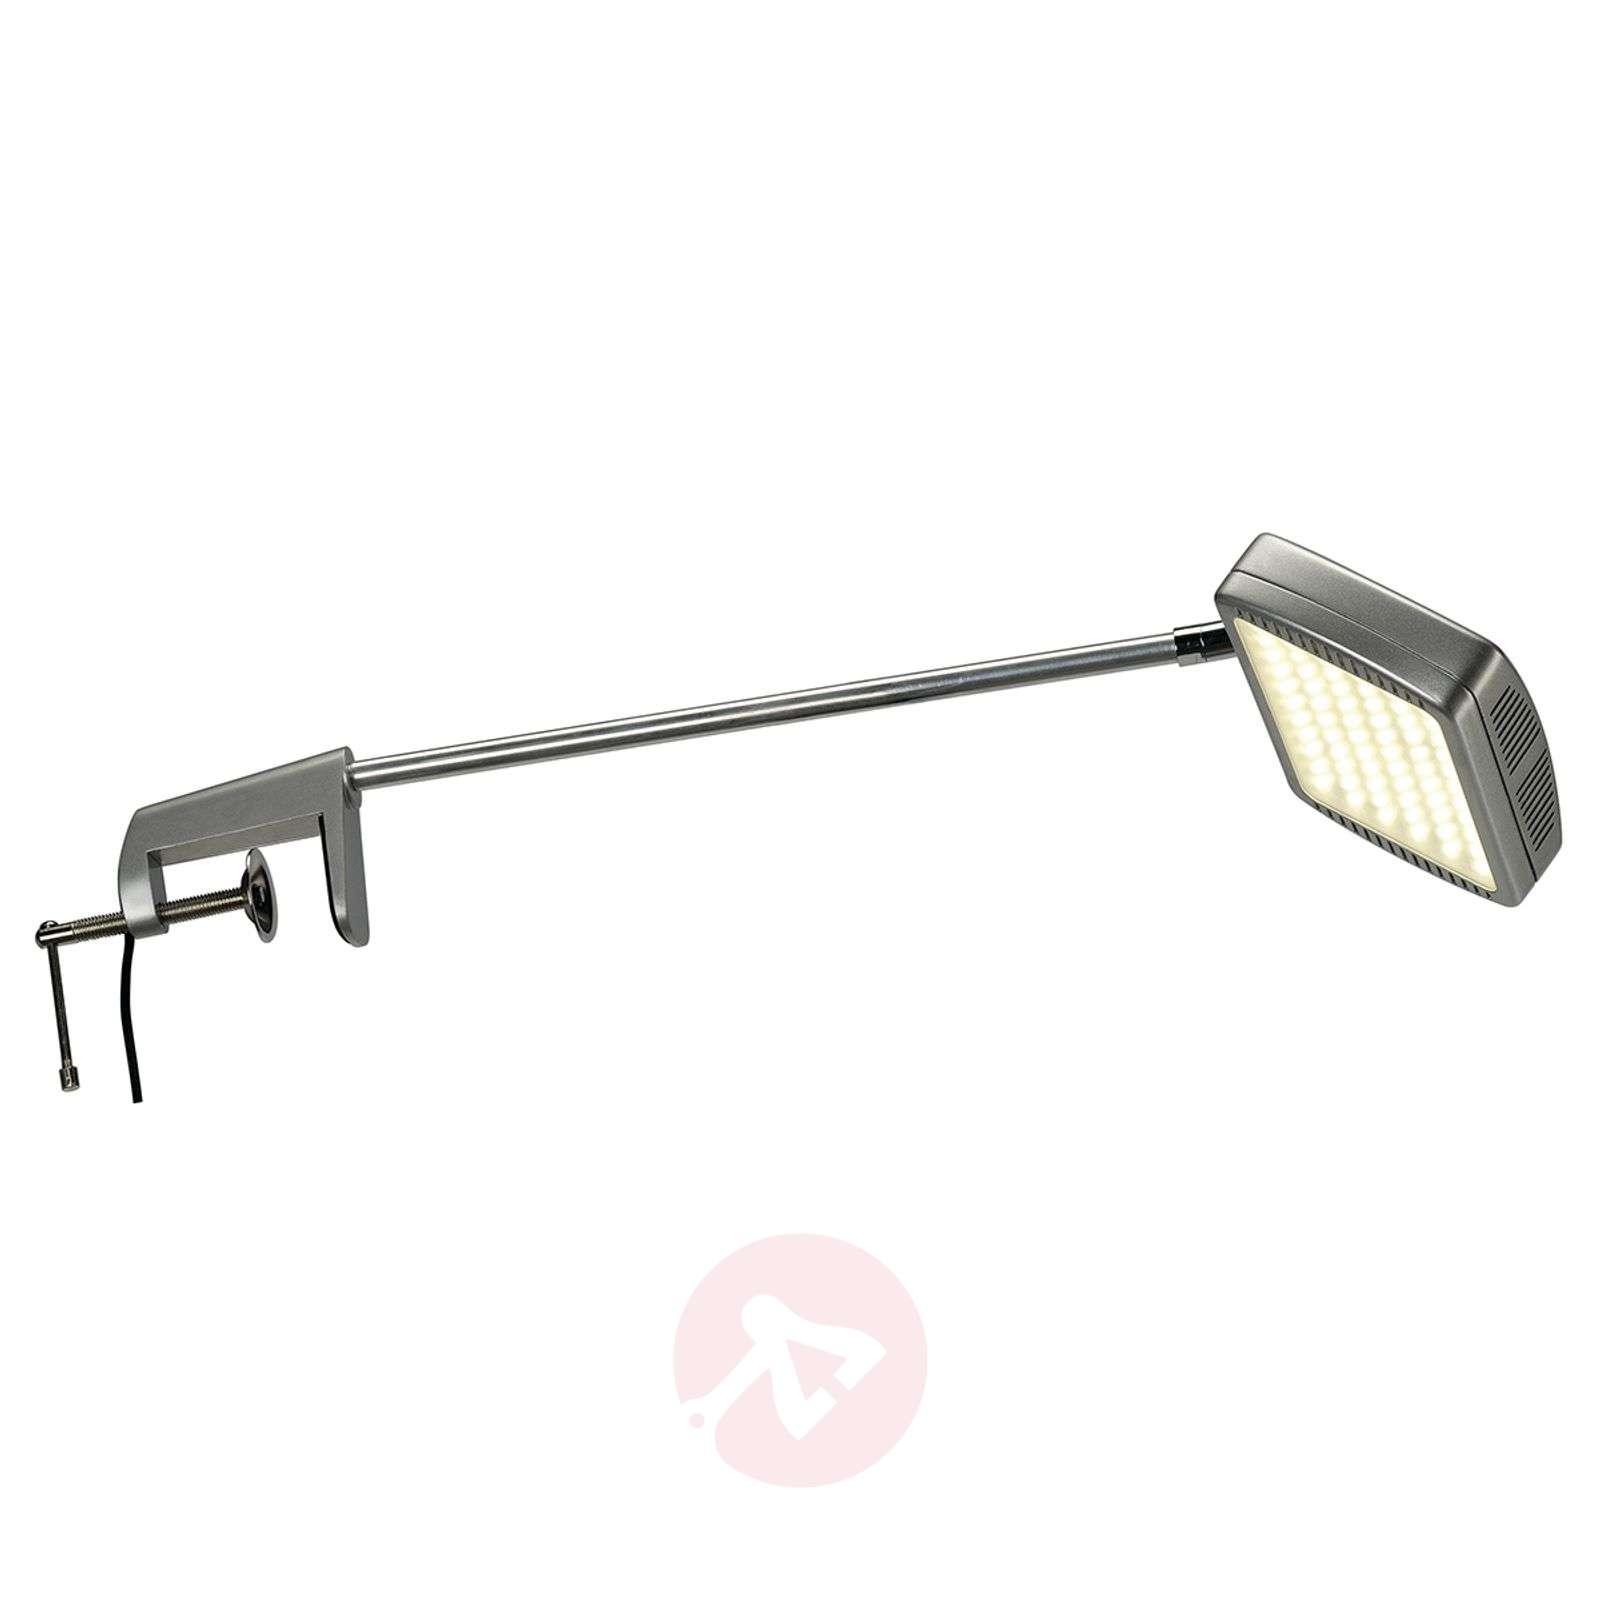 Moderni LED-valaisin DISPLAY-5504299X-05